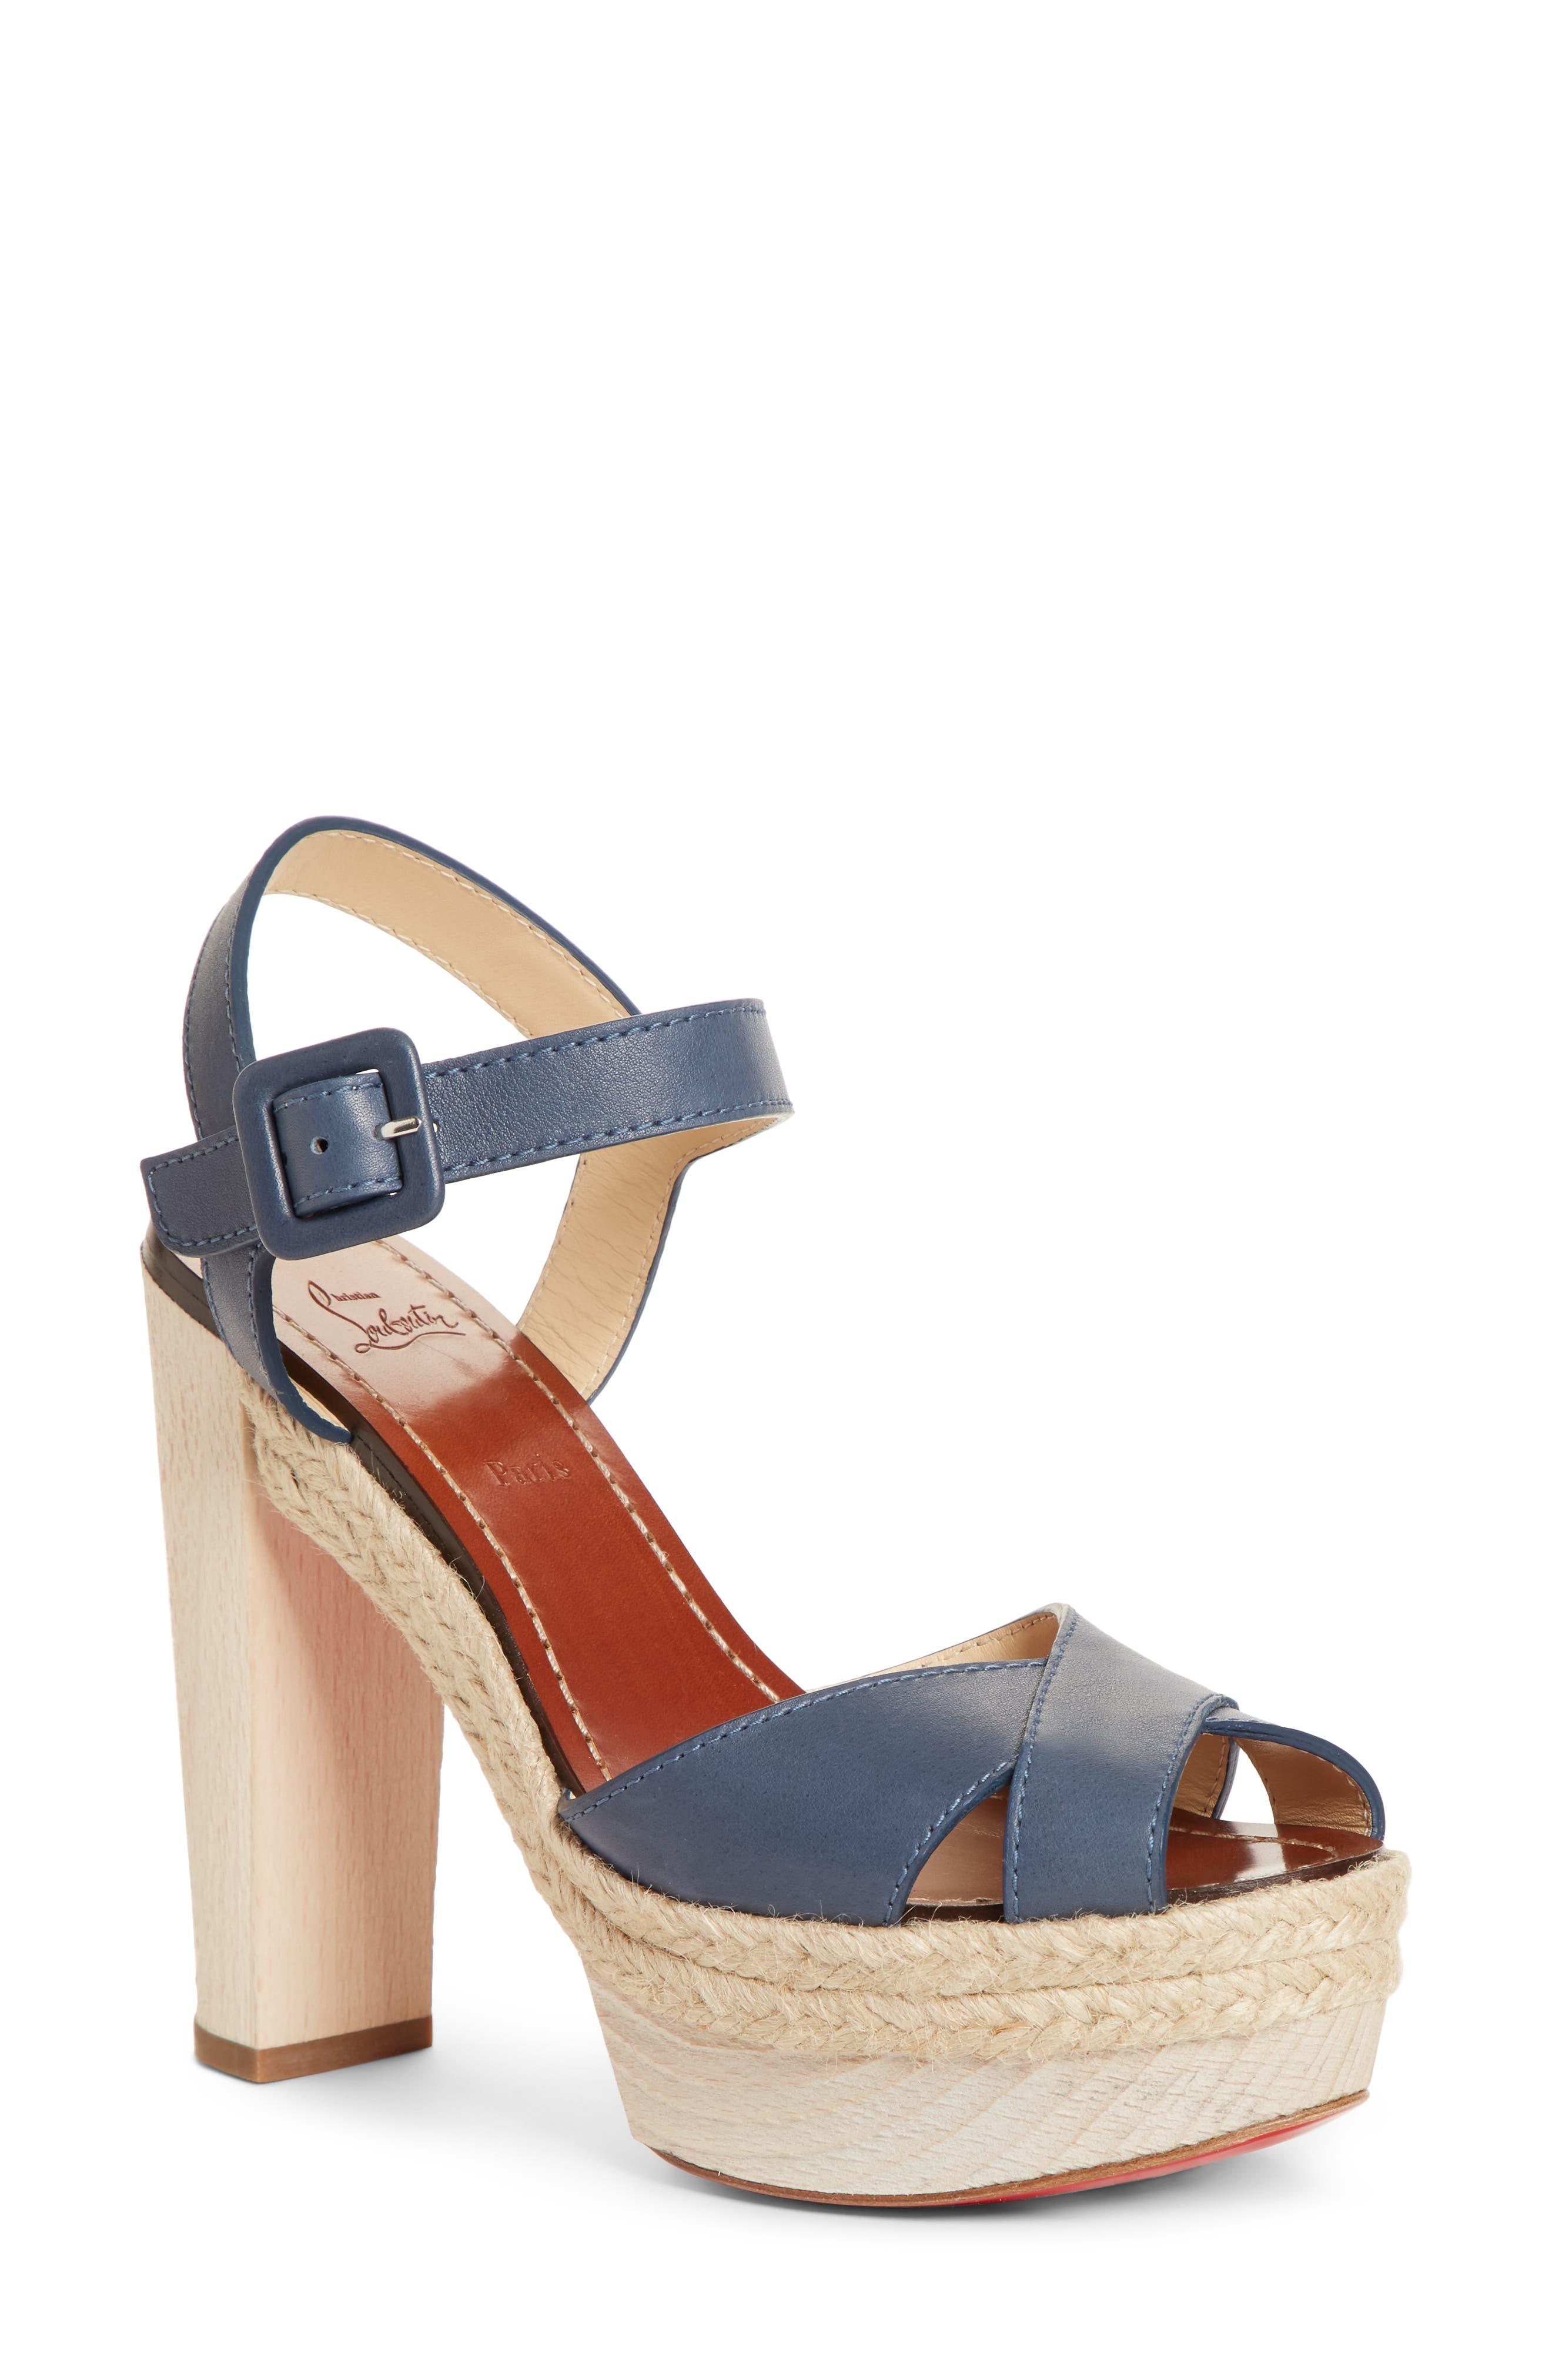 Christian Louboutin Slippers Cabana Platform Sandal